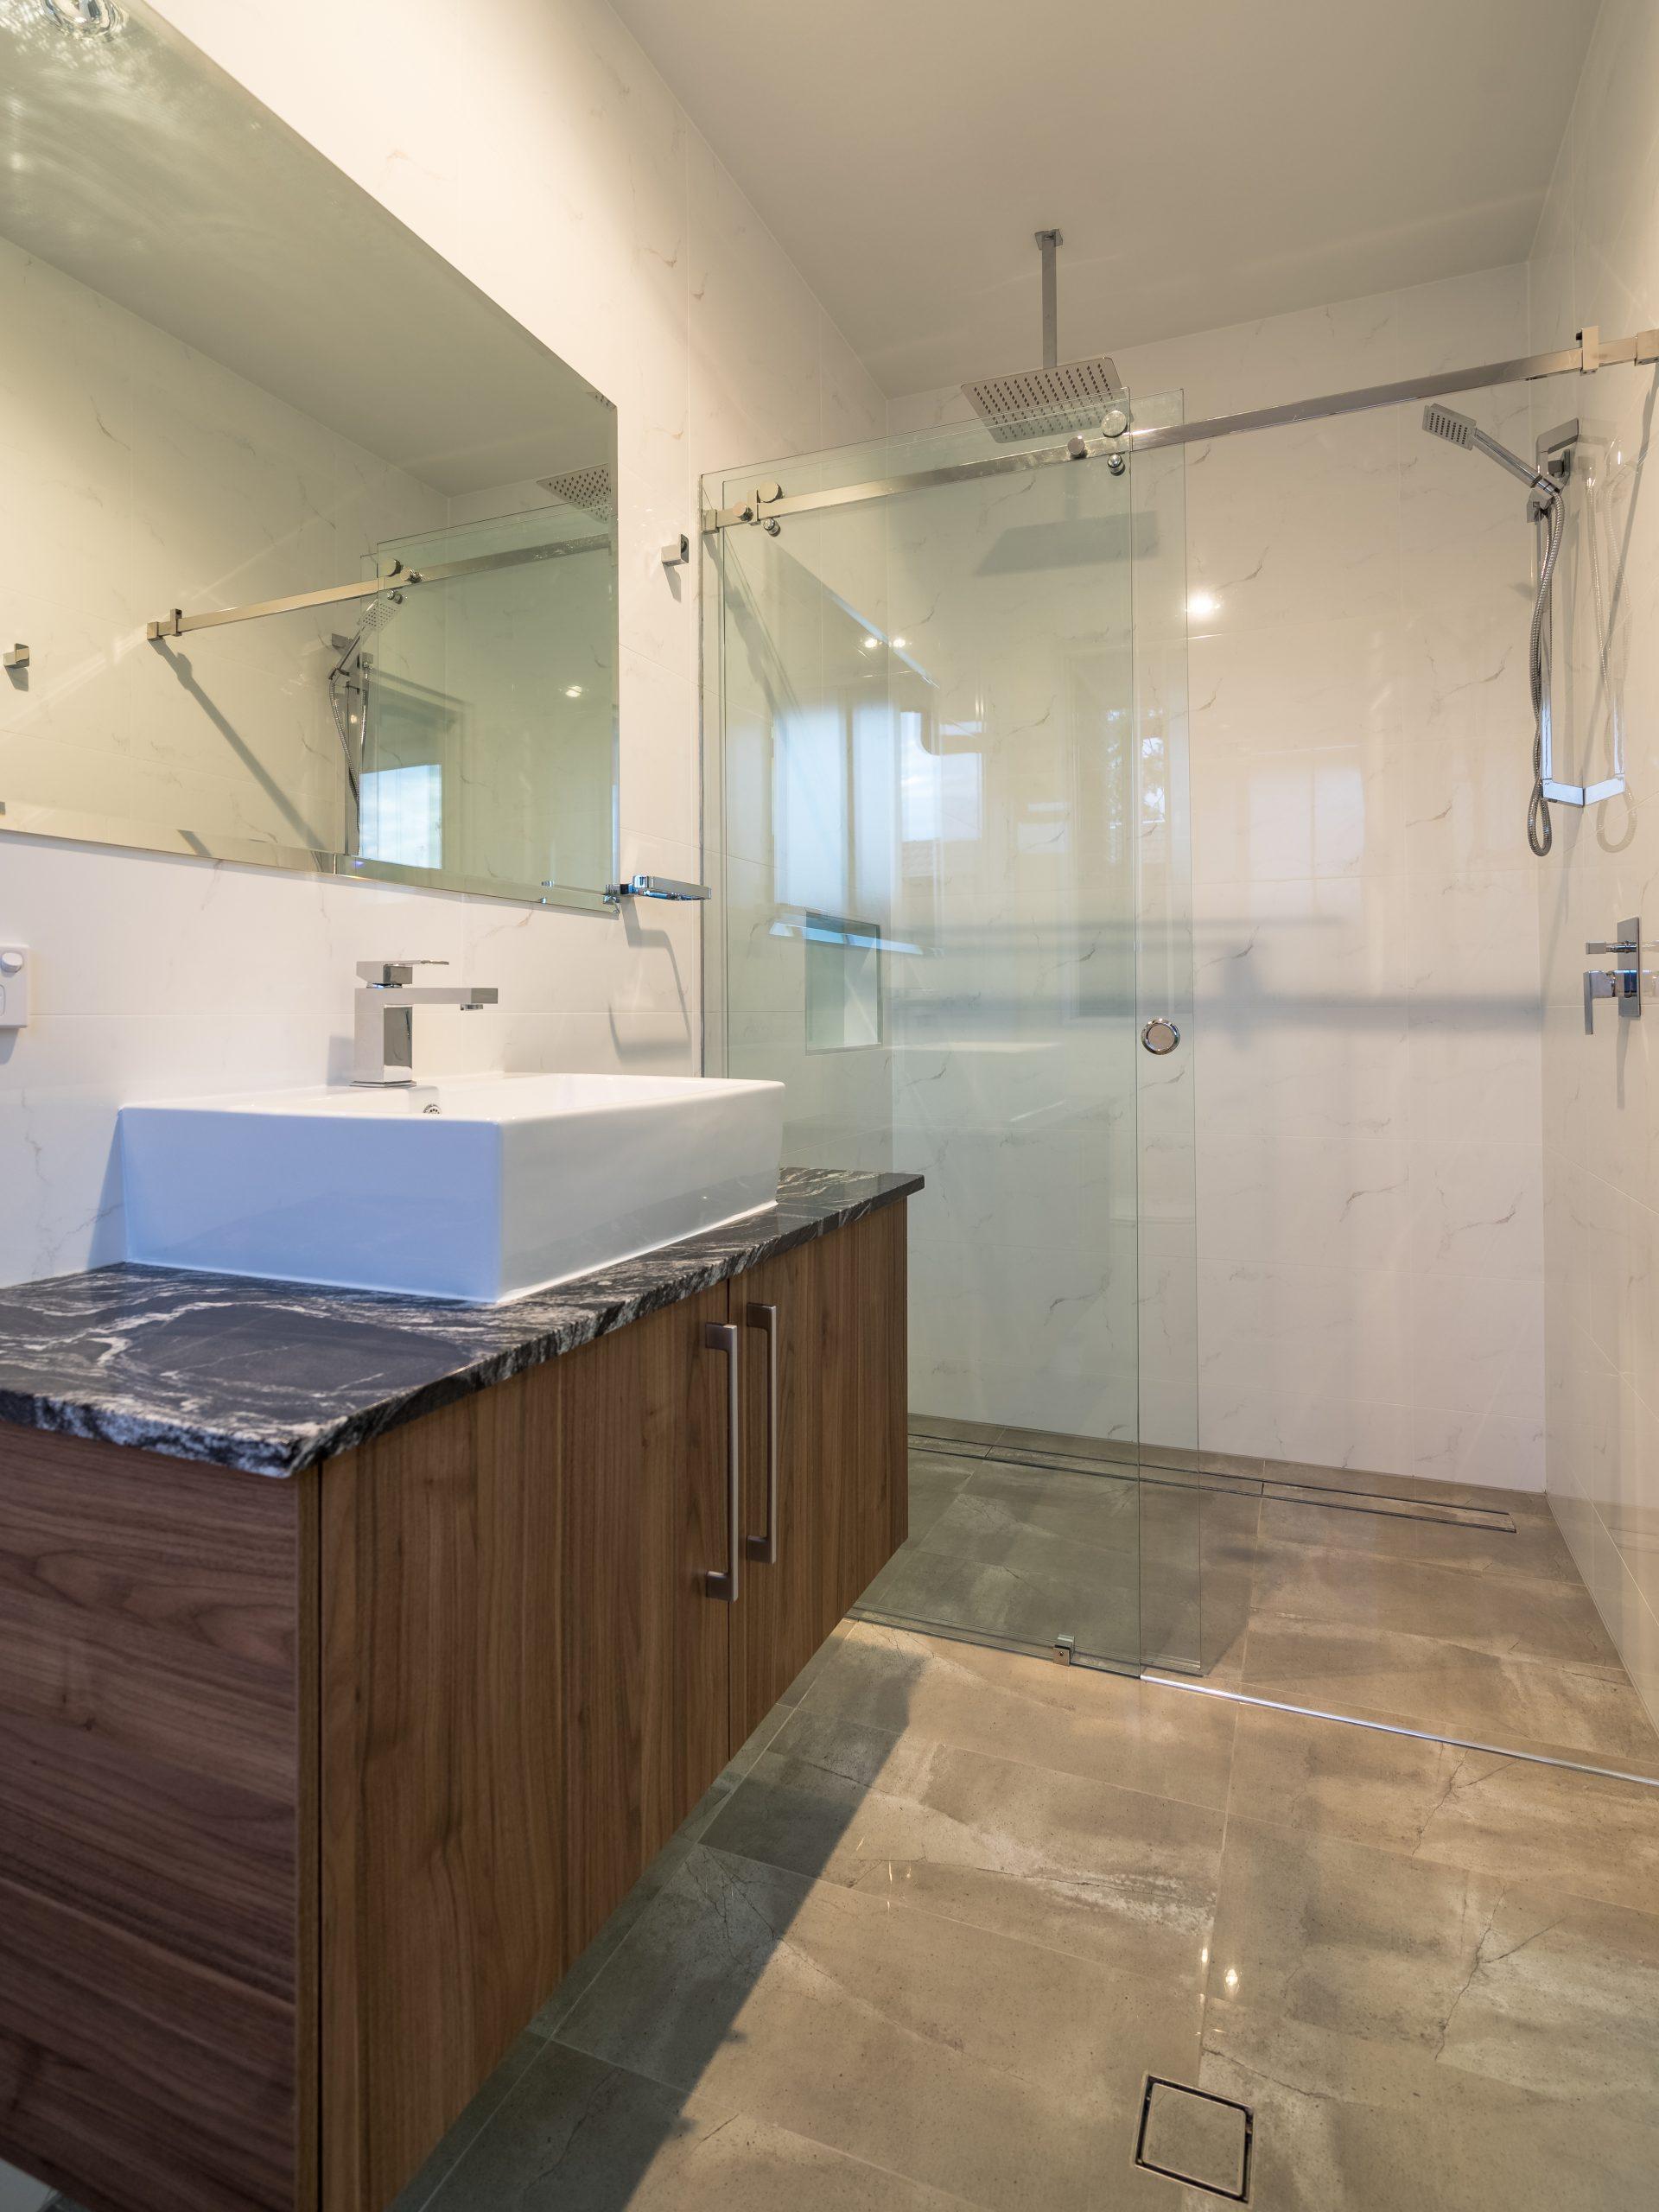 Woodville West - Grey - HBC Homes Adelaide - DSC09599-HDR